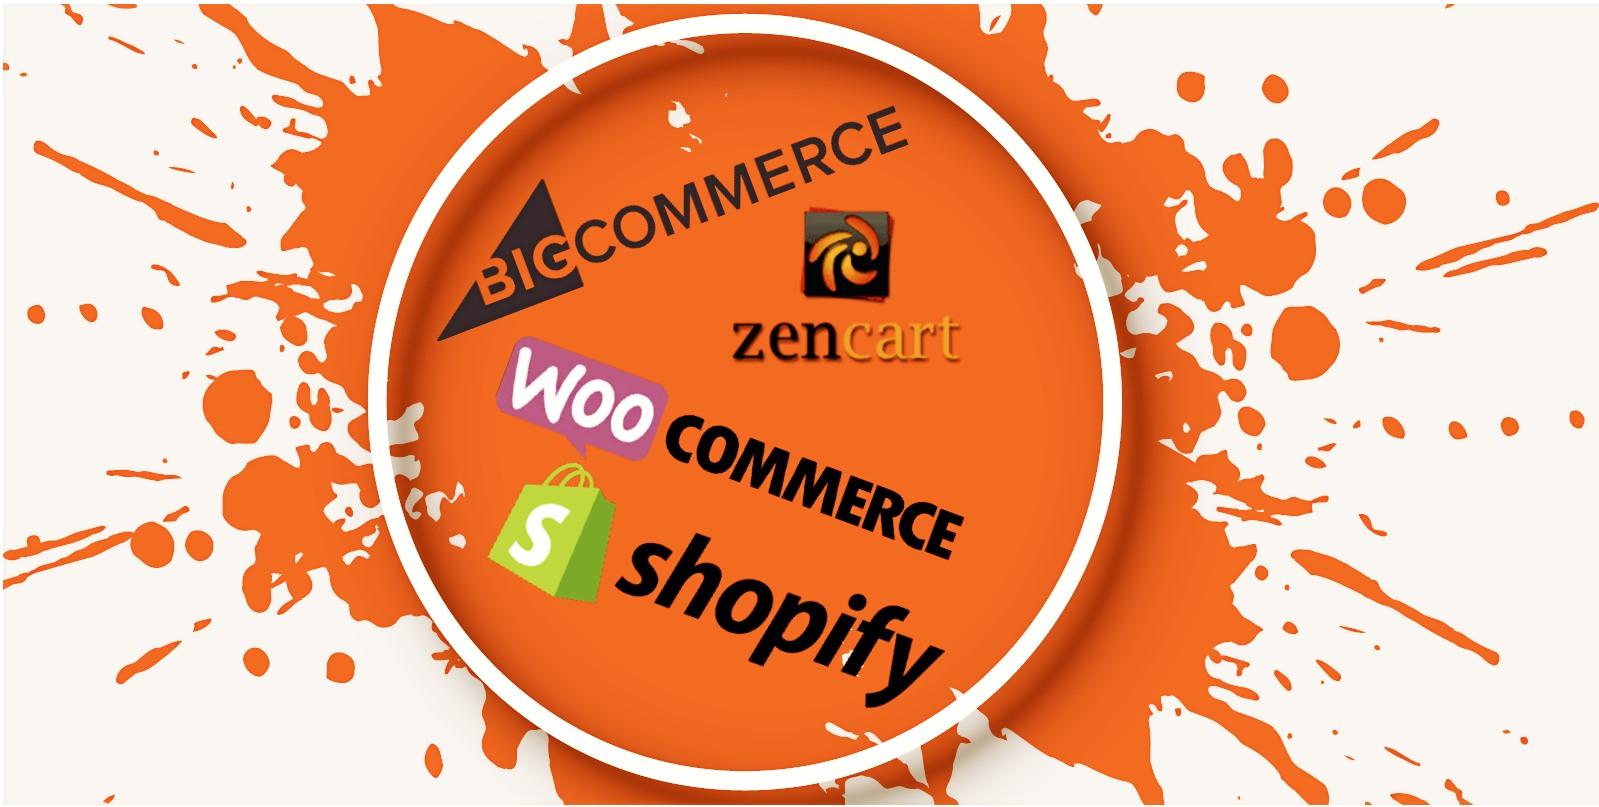 Multi-platform card skimmer found on Shopify, BigCommerce stores